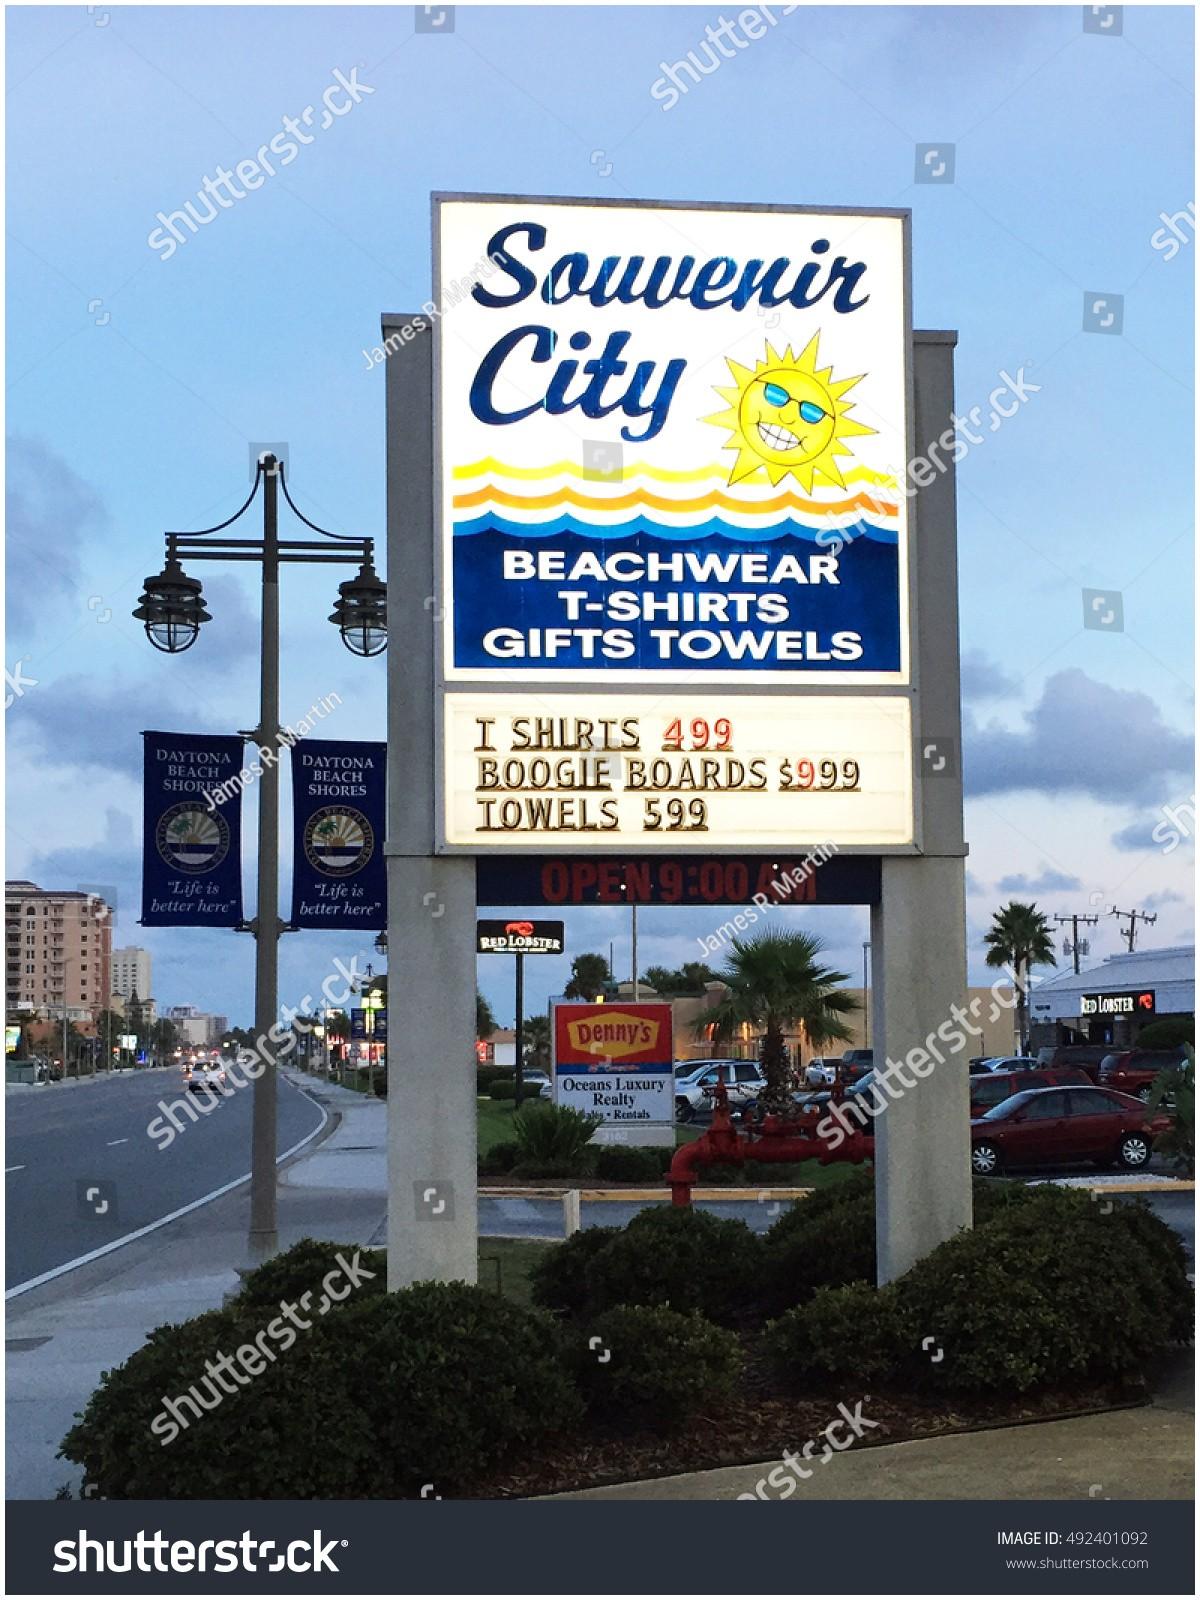 Made In Italy Daytona Beach Luxury Daytona Beach Shoresflseptember 30 2016 Illuminated Stock